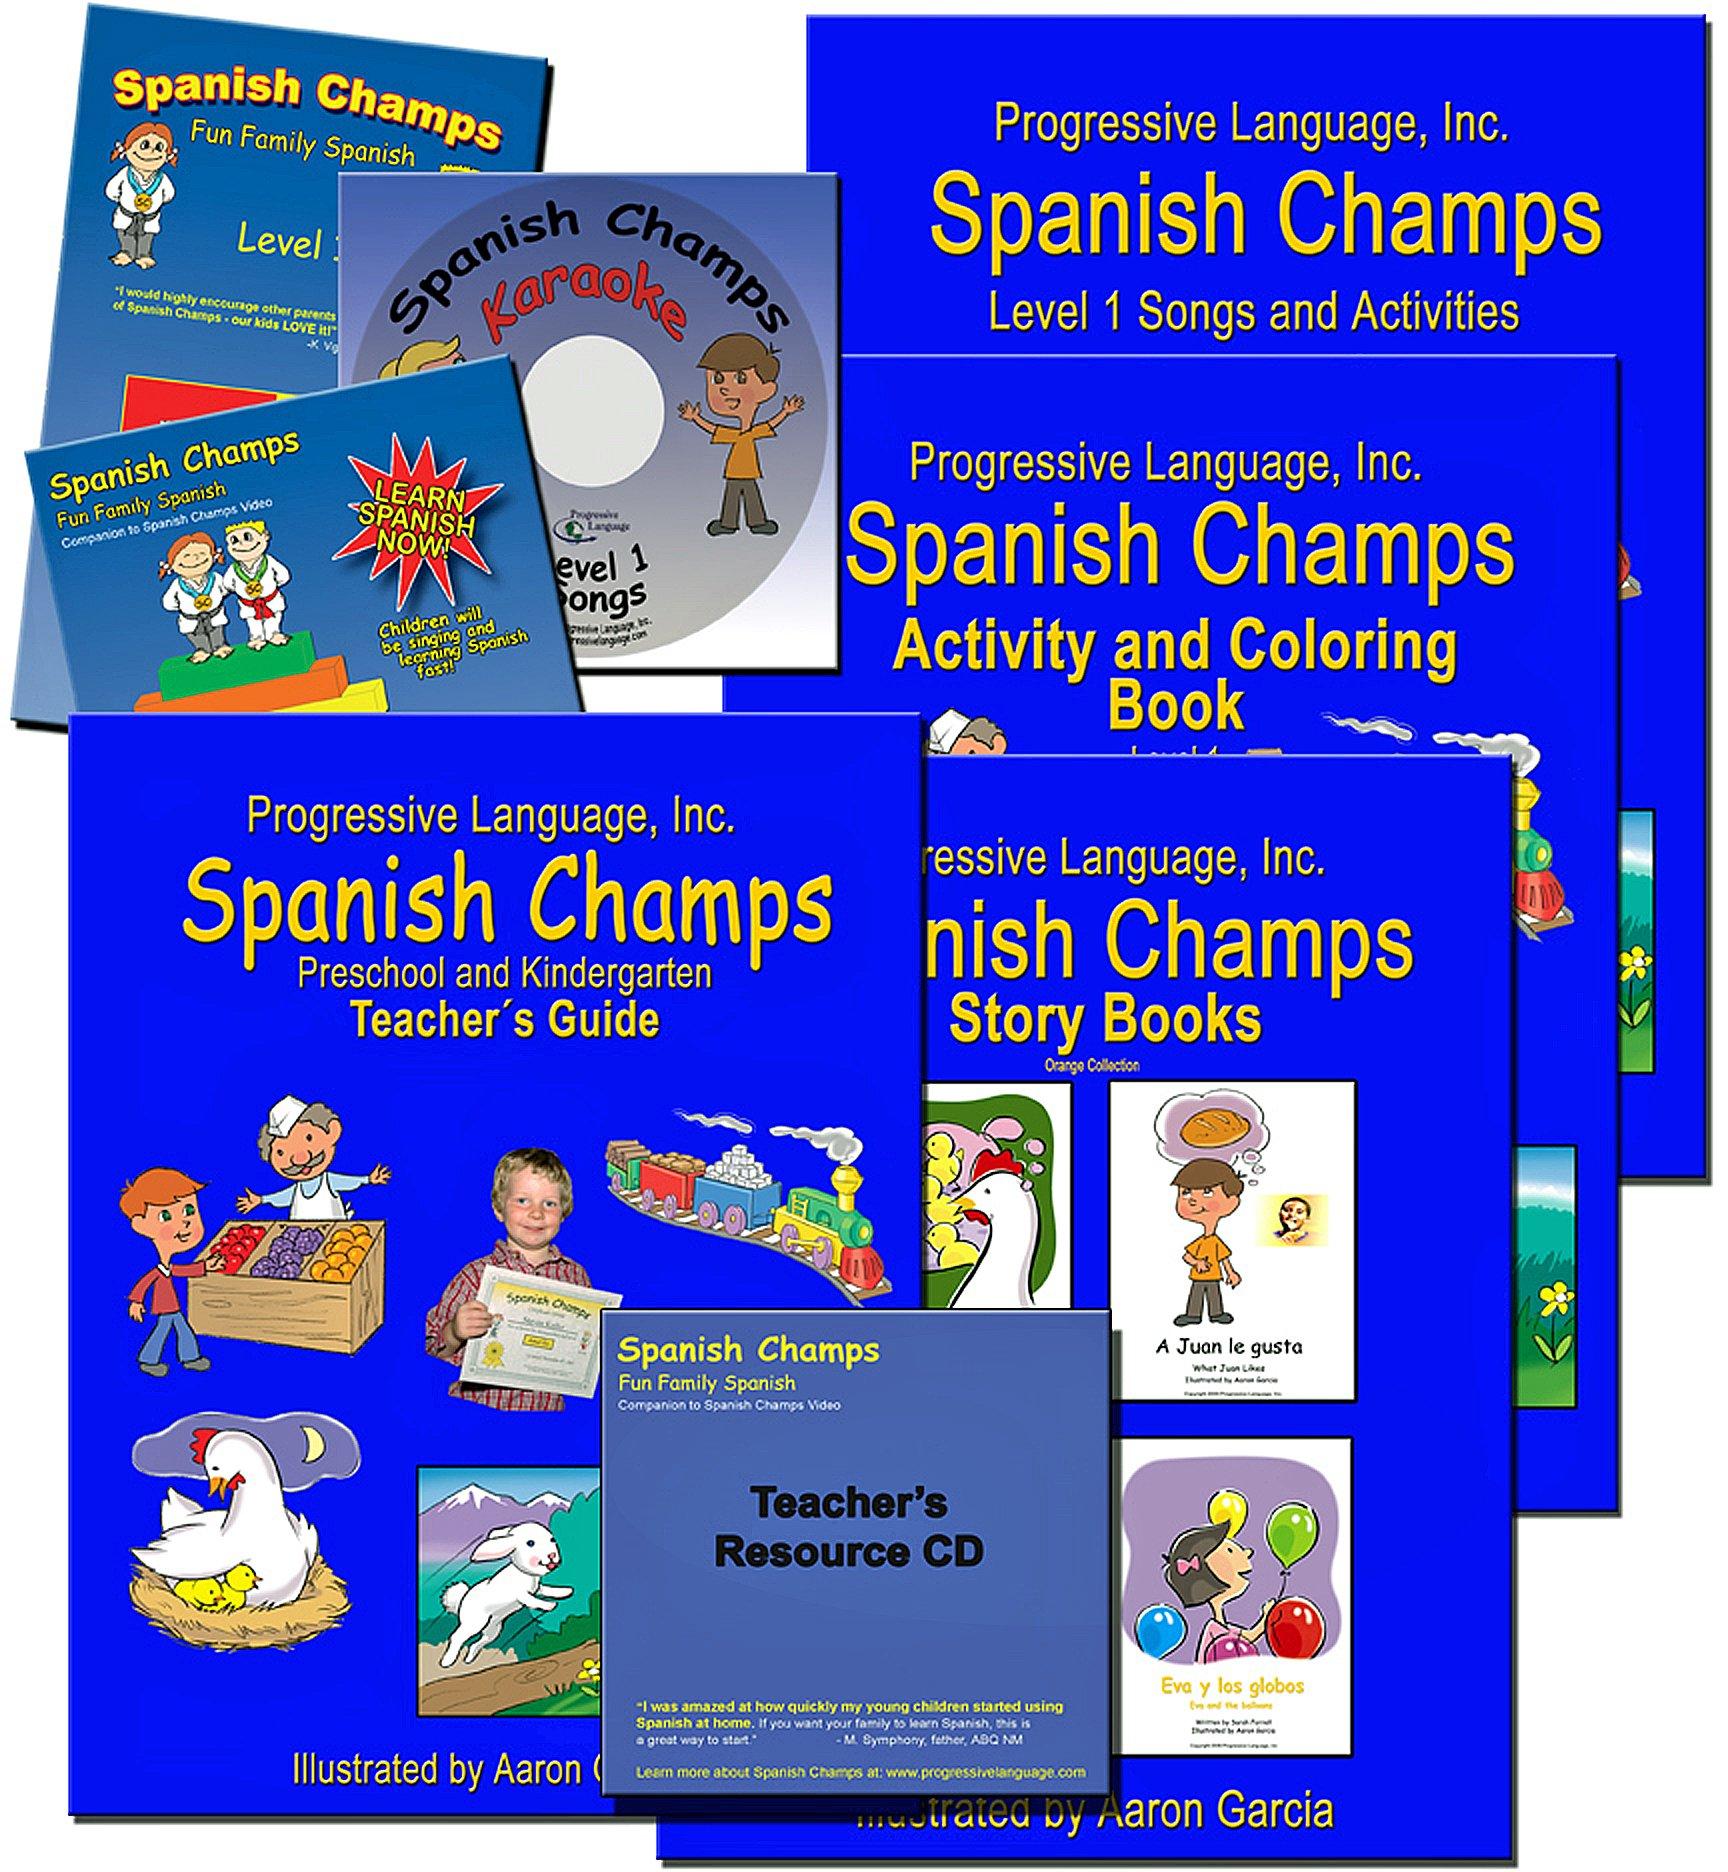 Preschool Spanish Curriculum, Spanish Champs Level 1 Kit